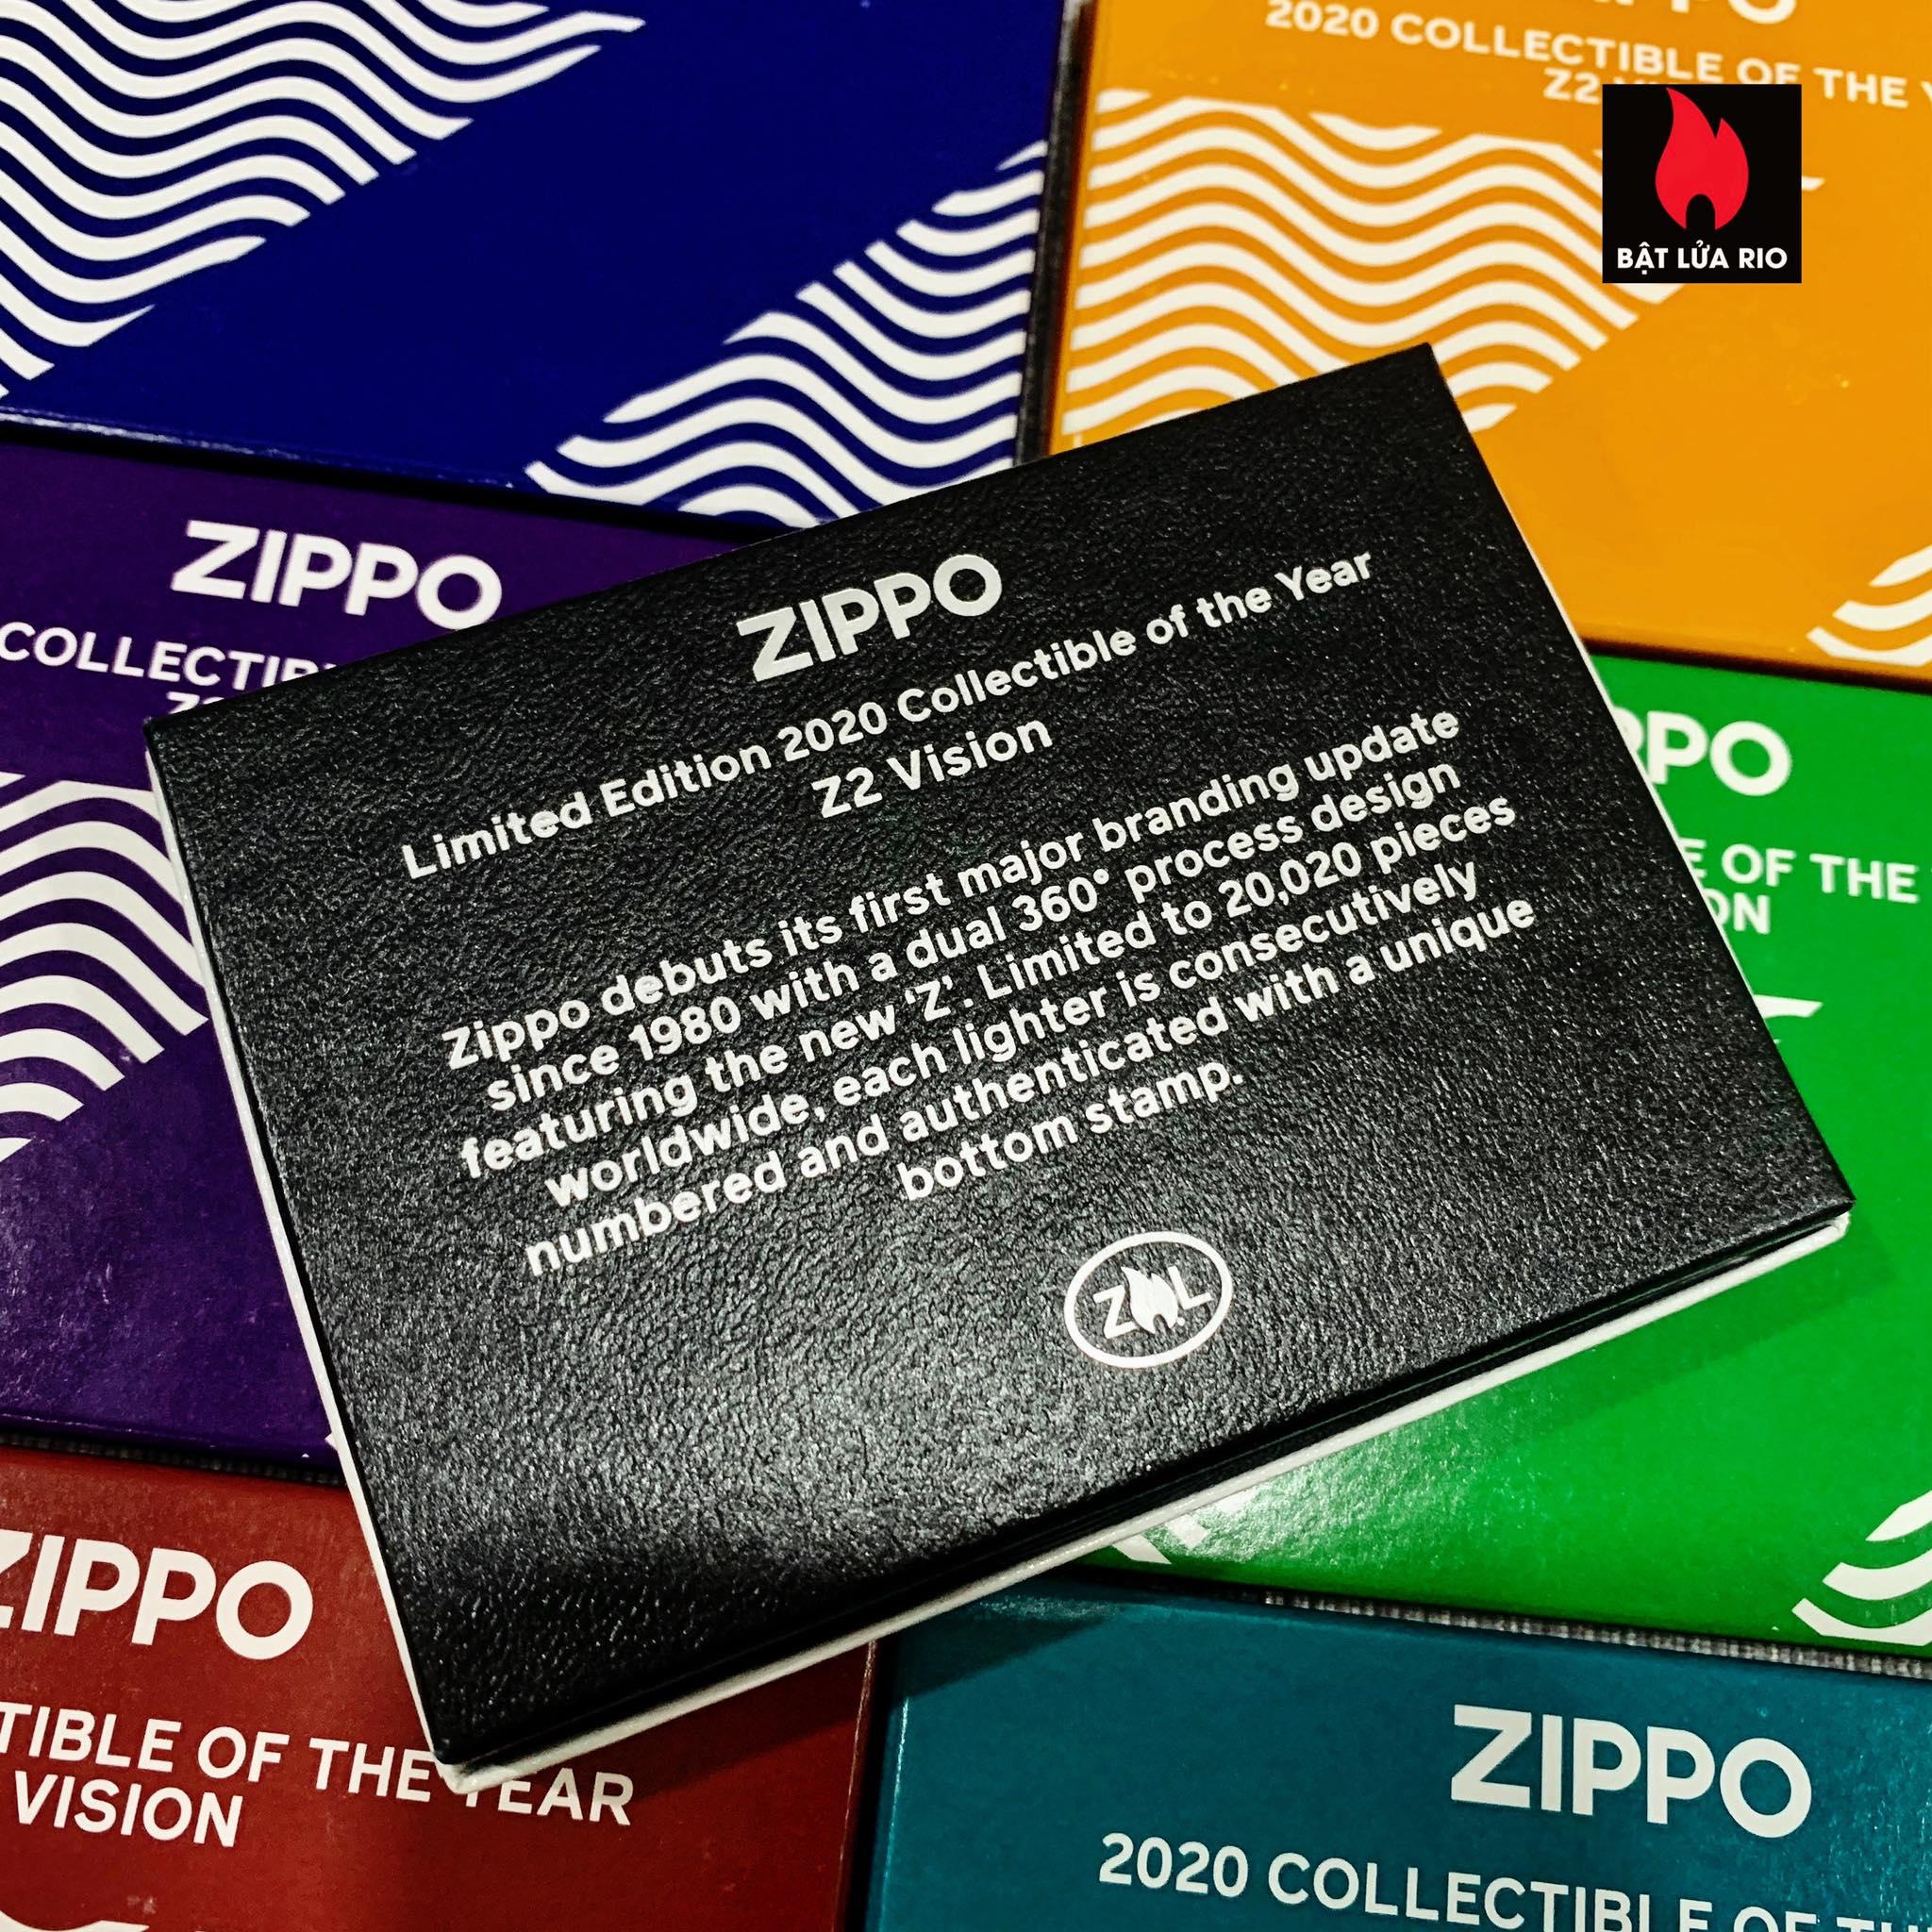 Zippo 49194 - Zippo 2020 Collectible Of The Year - Zippo Coty 2020 - Zippo Z2 Vision 22